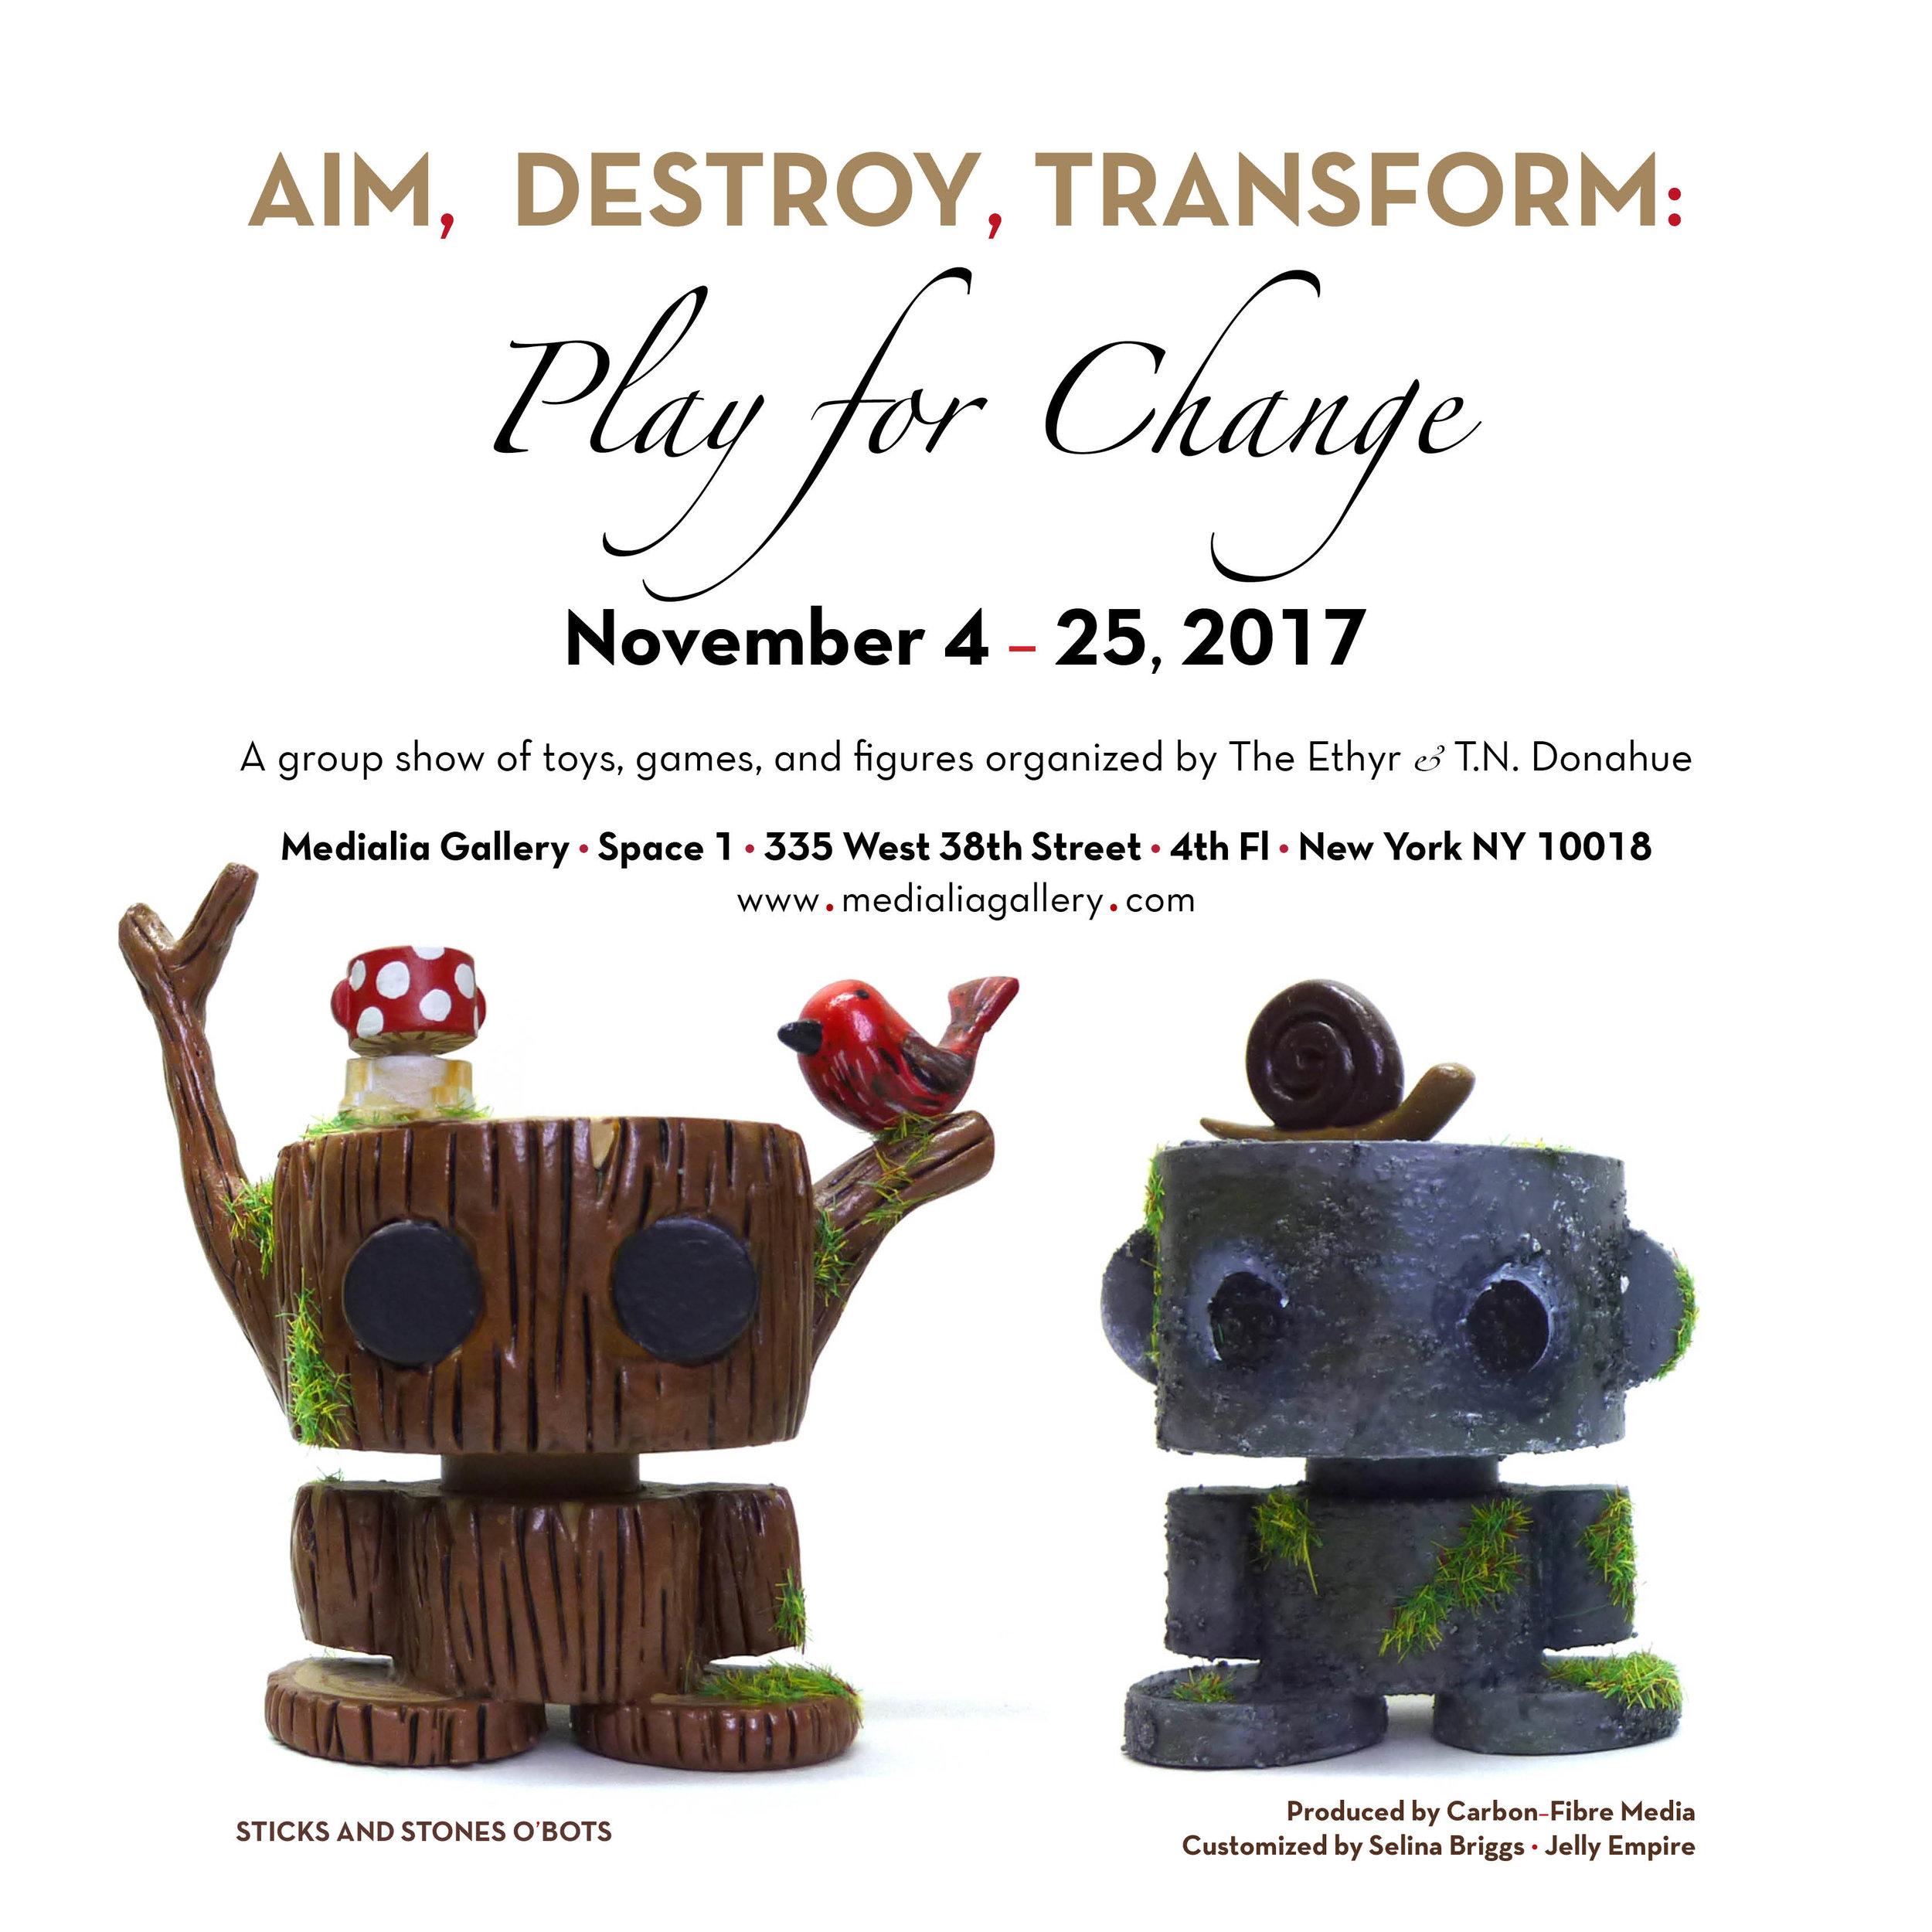 MedialiaGallery_The_Ethyr_AimDestroyTransform_Toy_Show_announcement_Sticks_Stones_OBOTs_Selina_Briggs_November_2017.jpg.jpg